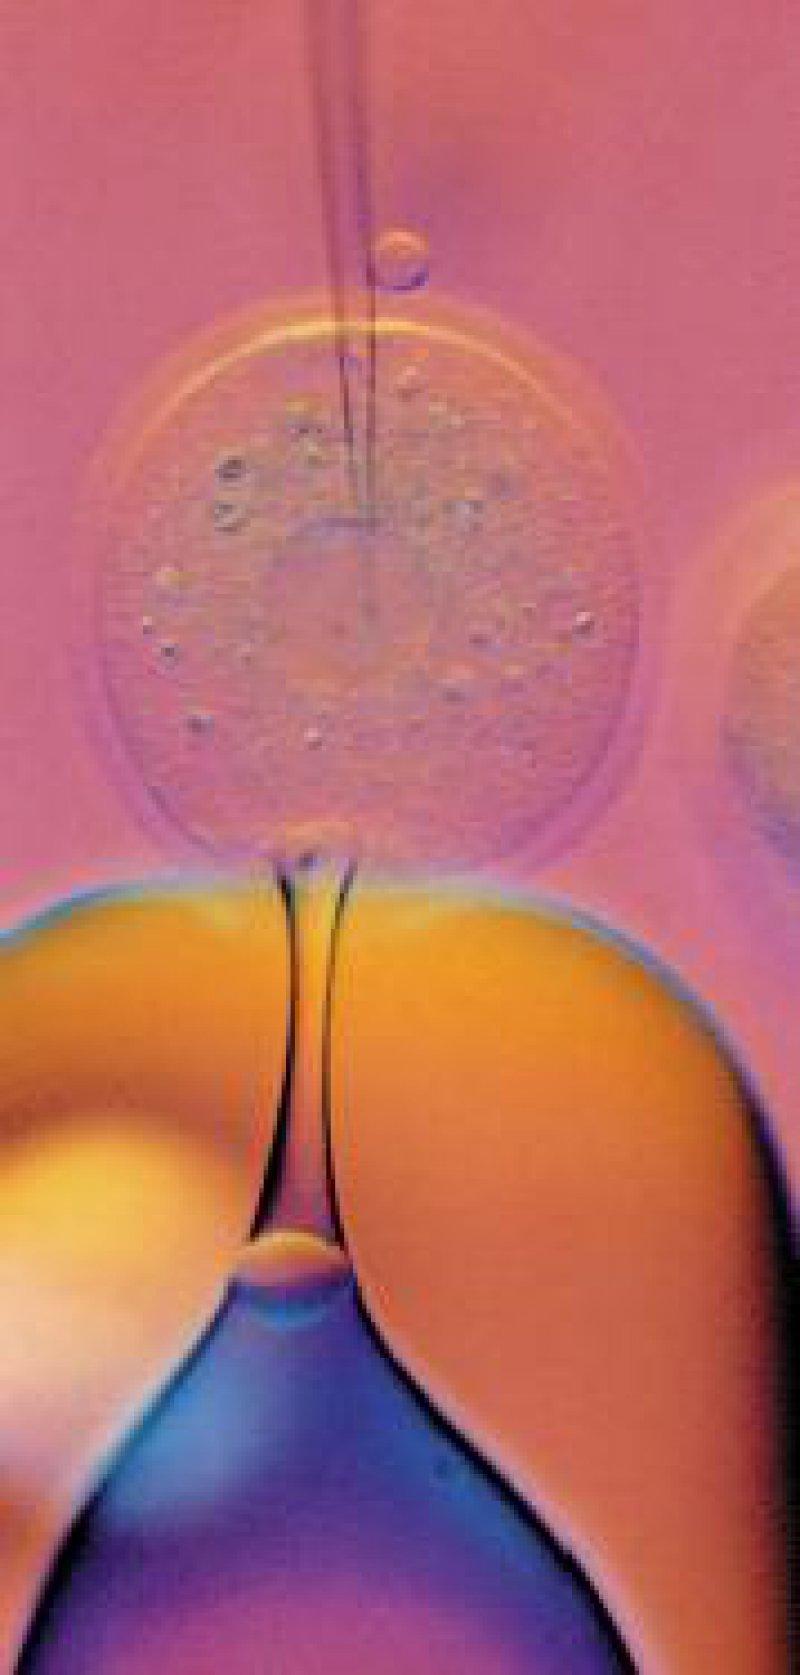 Intrazytoplasmatische Spermieninjektion (ICSI). Foto: Bayer AG